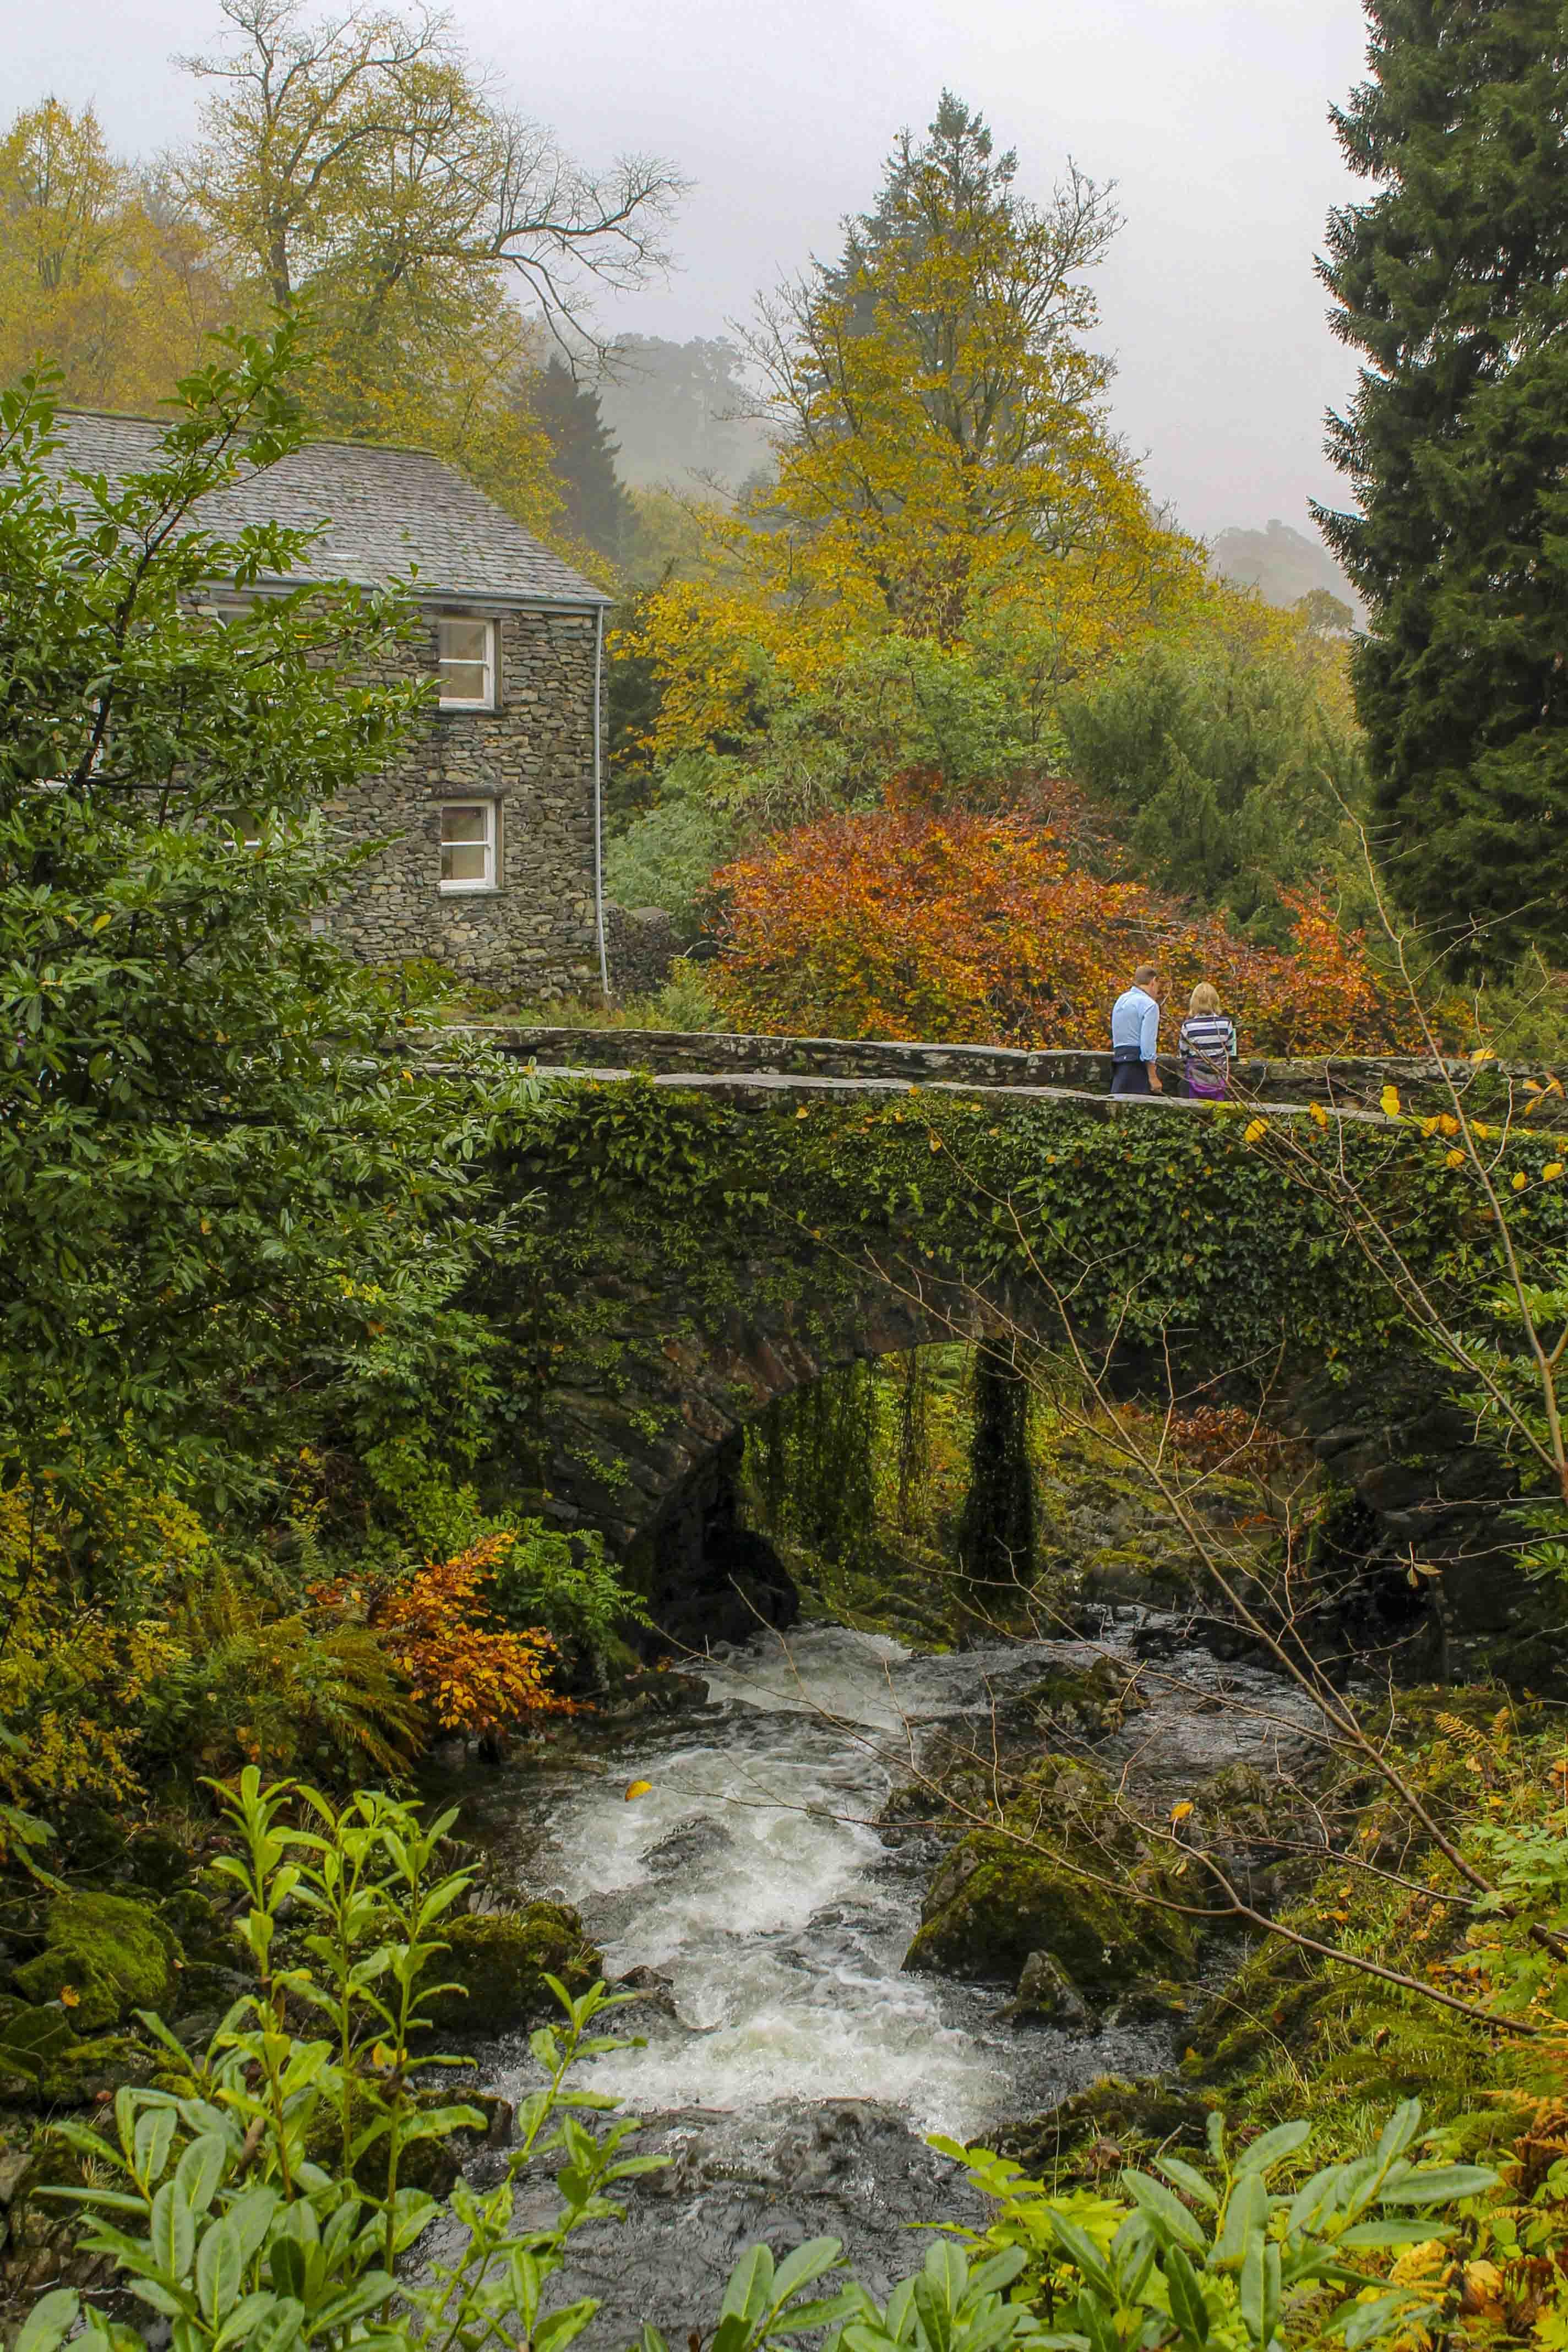 Charmant Engeland in Herfstkleuren